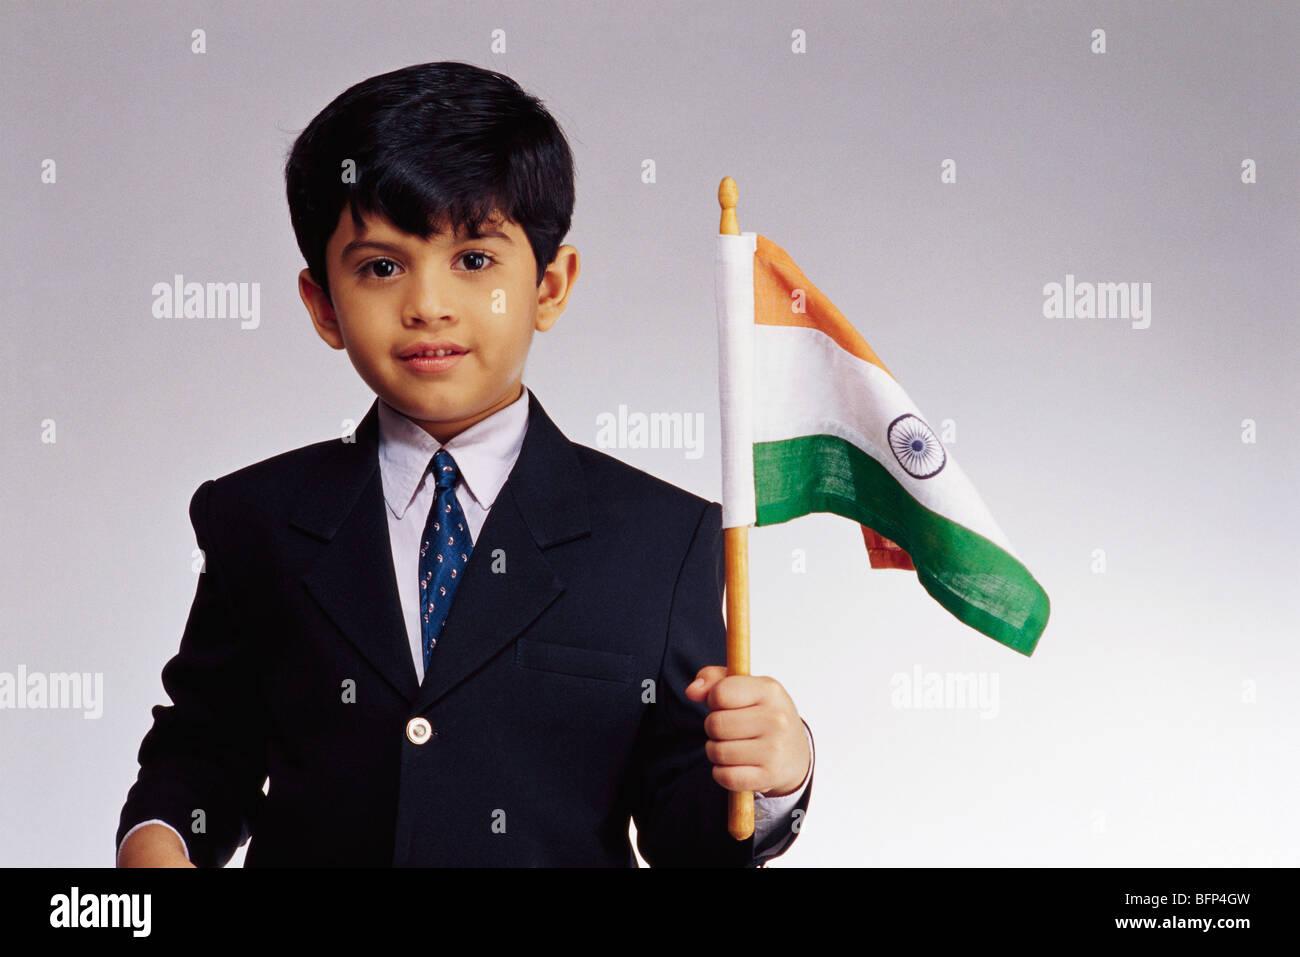 c678e0455 VDA 63628 : Boy dressed as Christian holding flag of India in hand MR#499